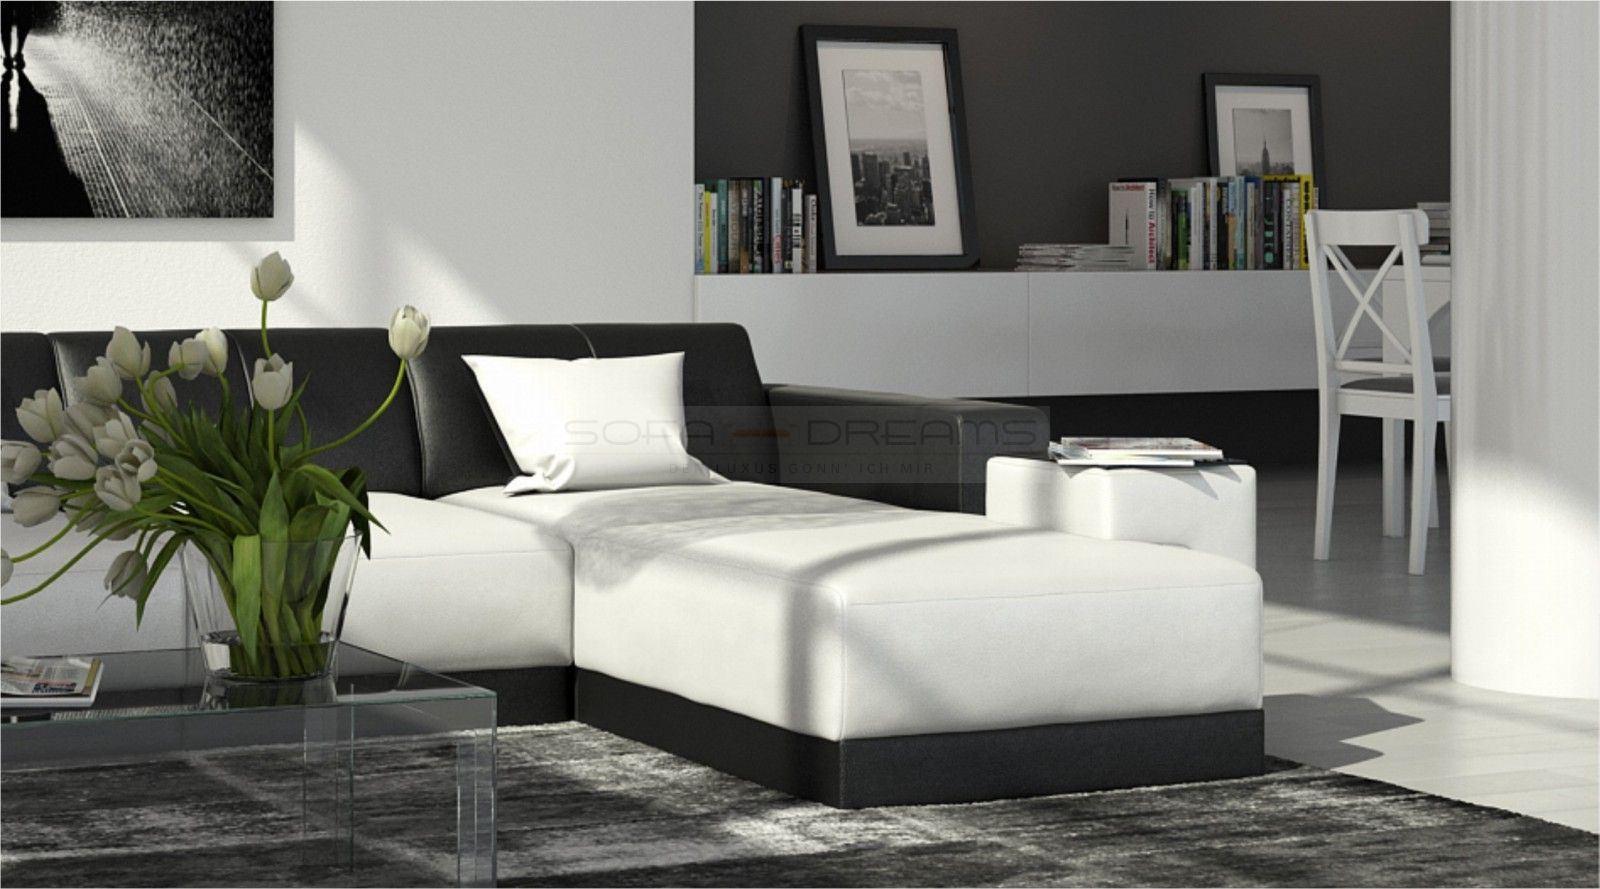 modernes ledersofa ecksofa couch garnitur ferragamo l form luxussofa designcouch ebay. Black Bedroom Furniture Sets. Home Design Ideas